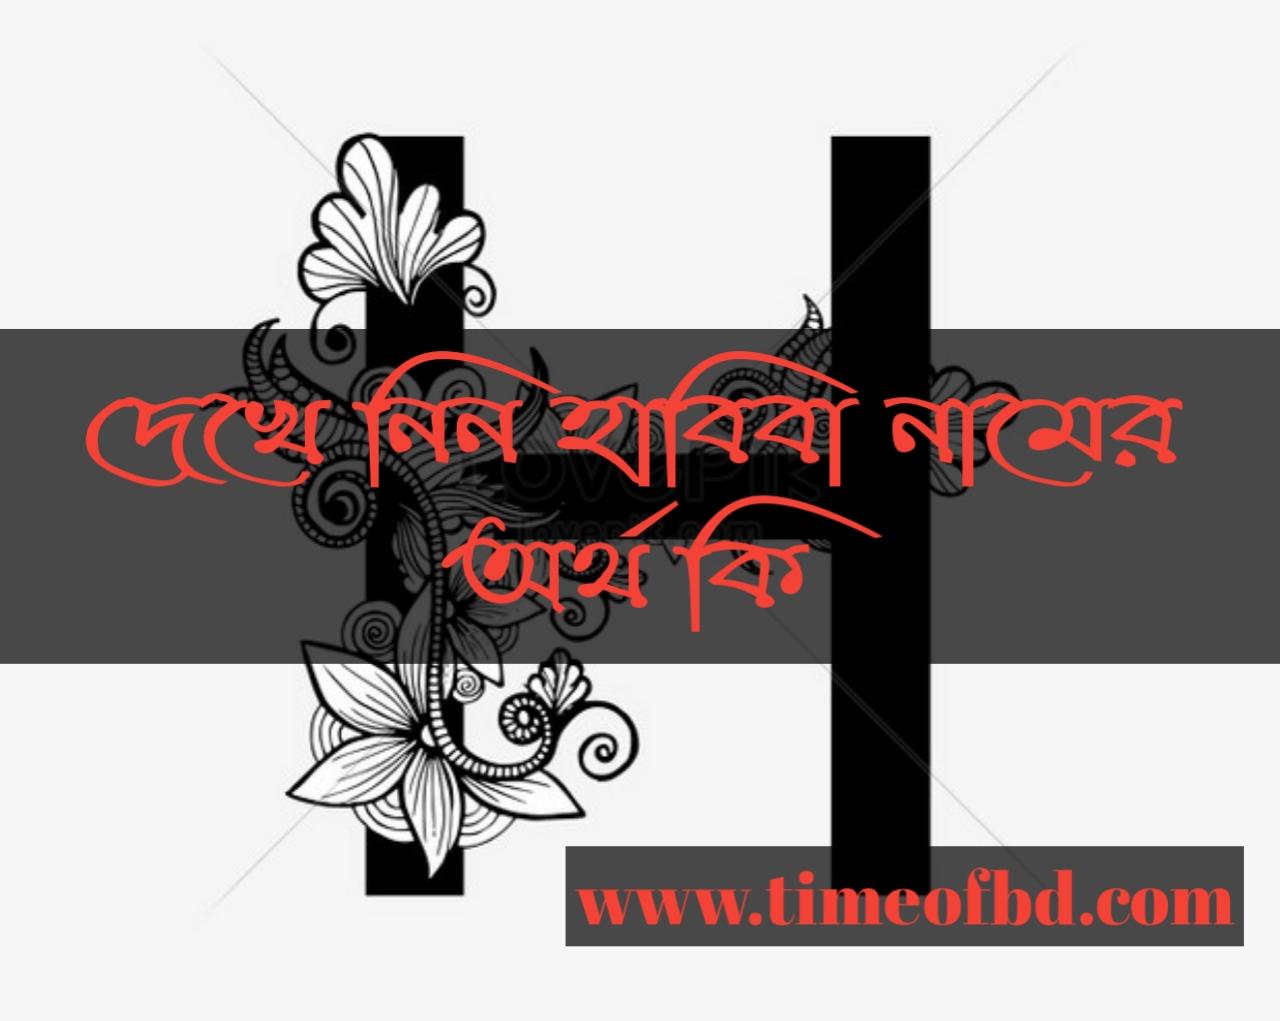 Habiba name meaning in Bengali, হাবিবা নামের অর্থ কি, হাবিবা নামের বাংলা অর্থ কি, হাবিবা নামের ইসলামিক অর্থ কি,